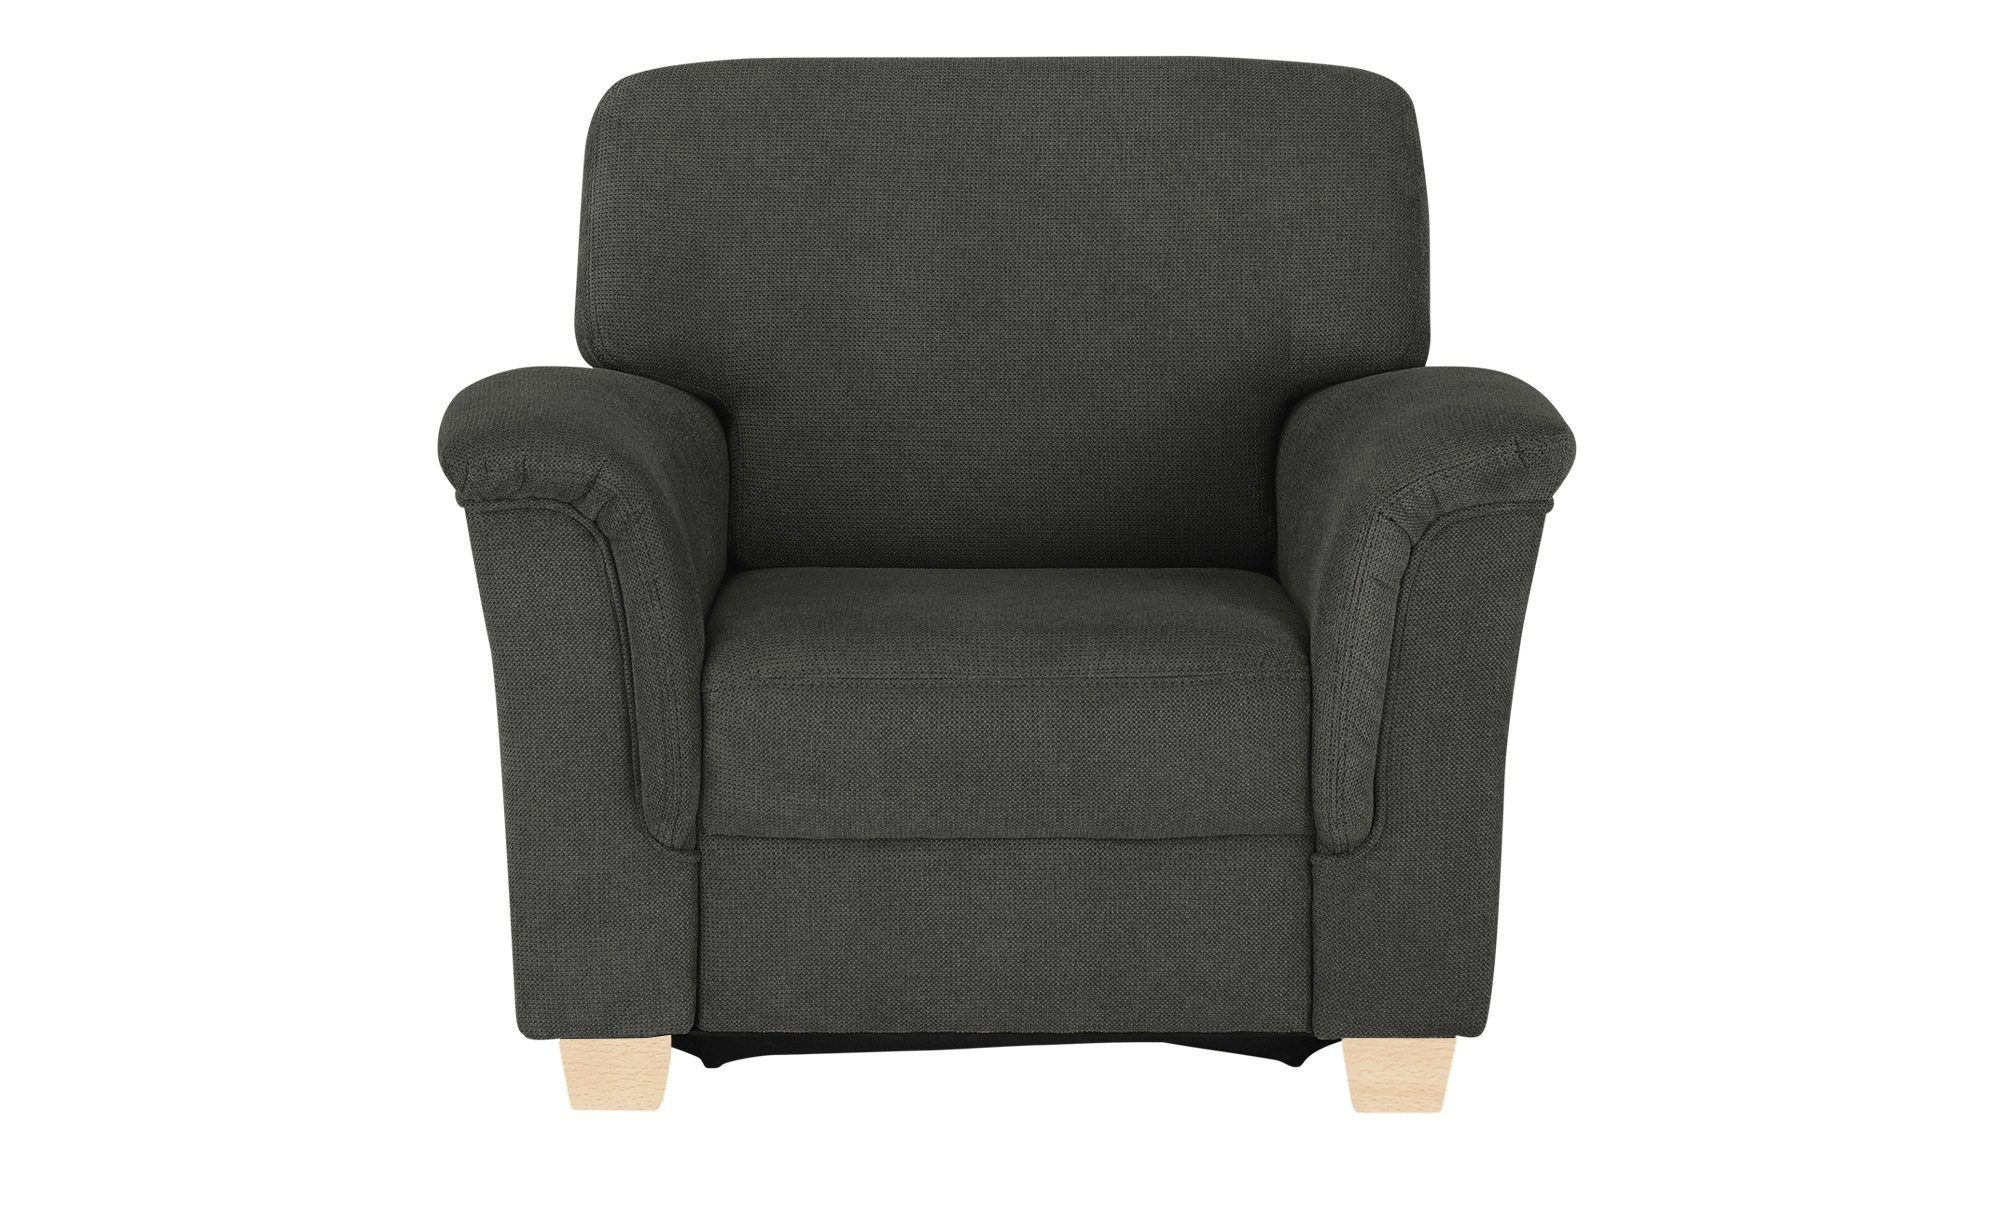 smart Sessel  Valencia ¦ grau ¦ Maße (cm): B: 100 H: 90 T: 93 Polstermöbel > Sessel > Polstersessel - Höffner